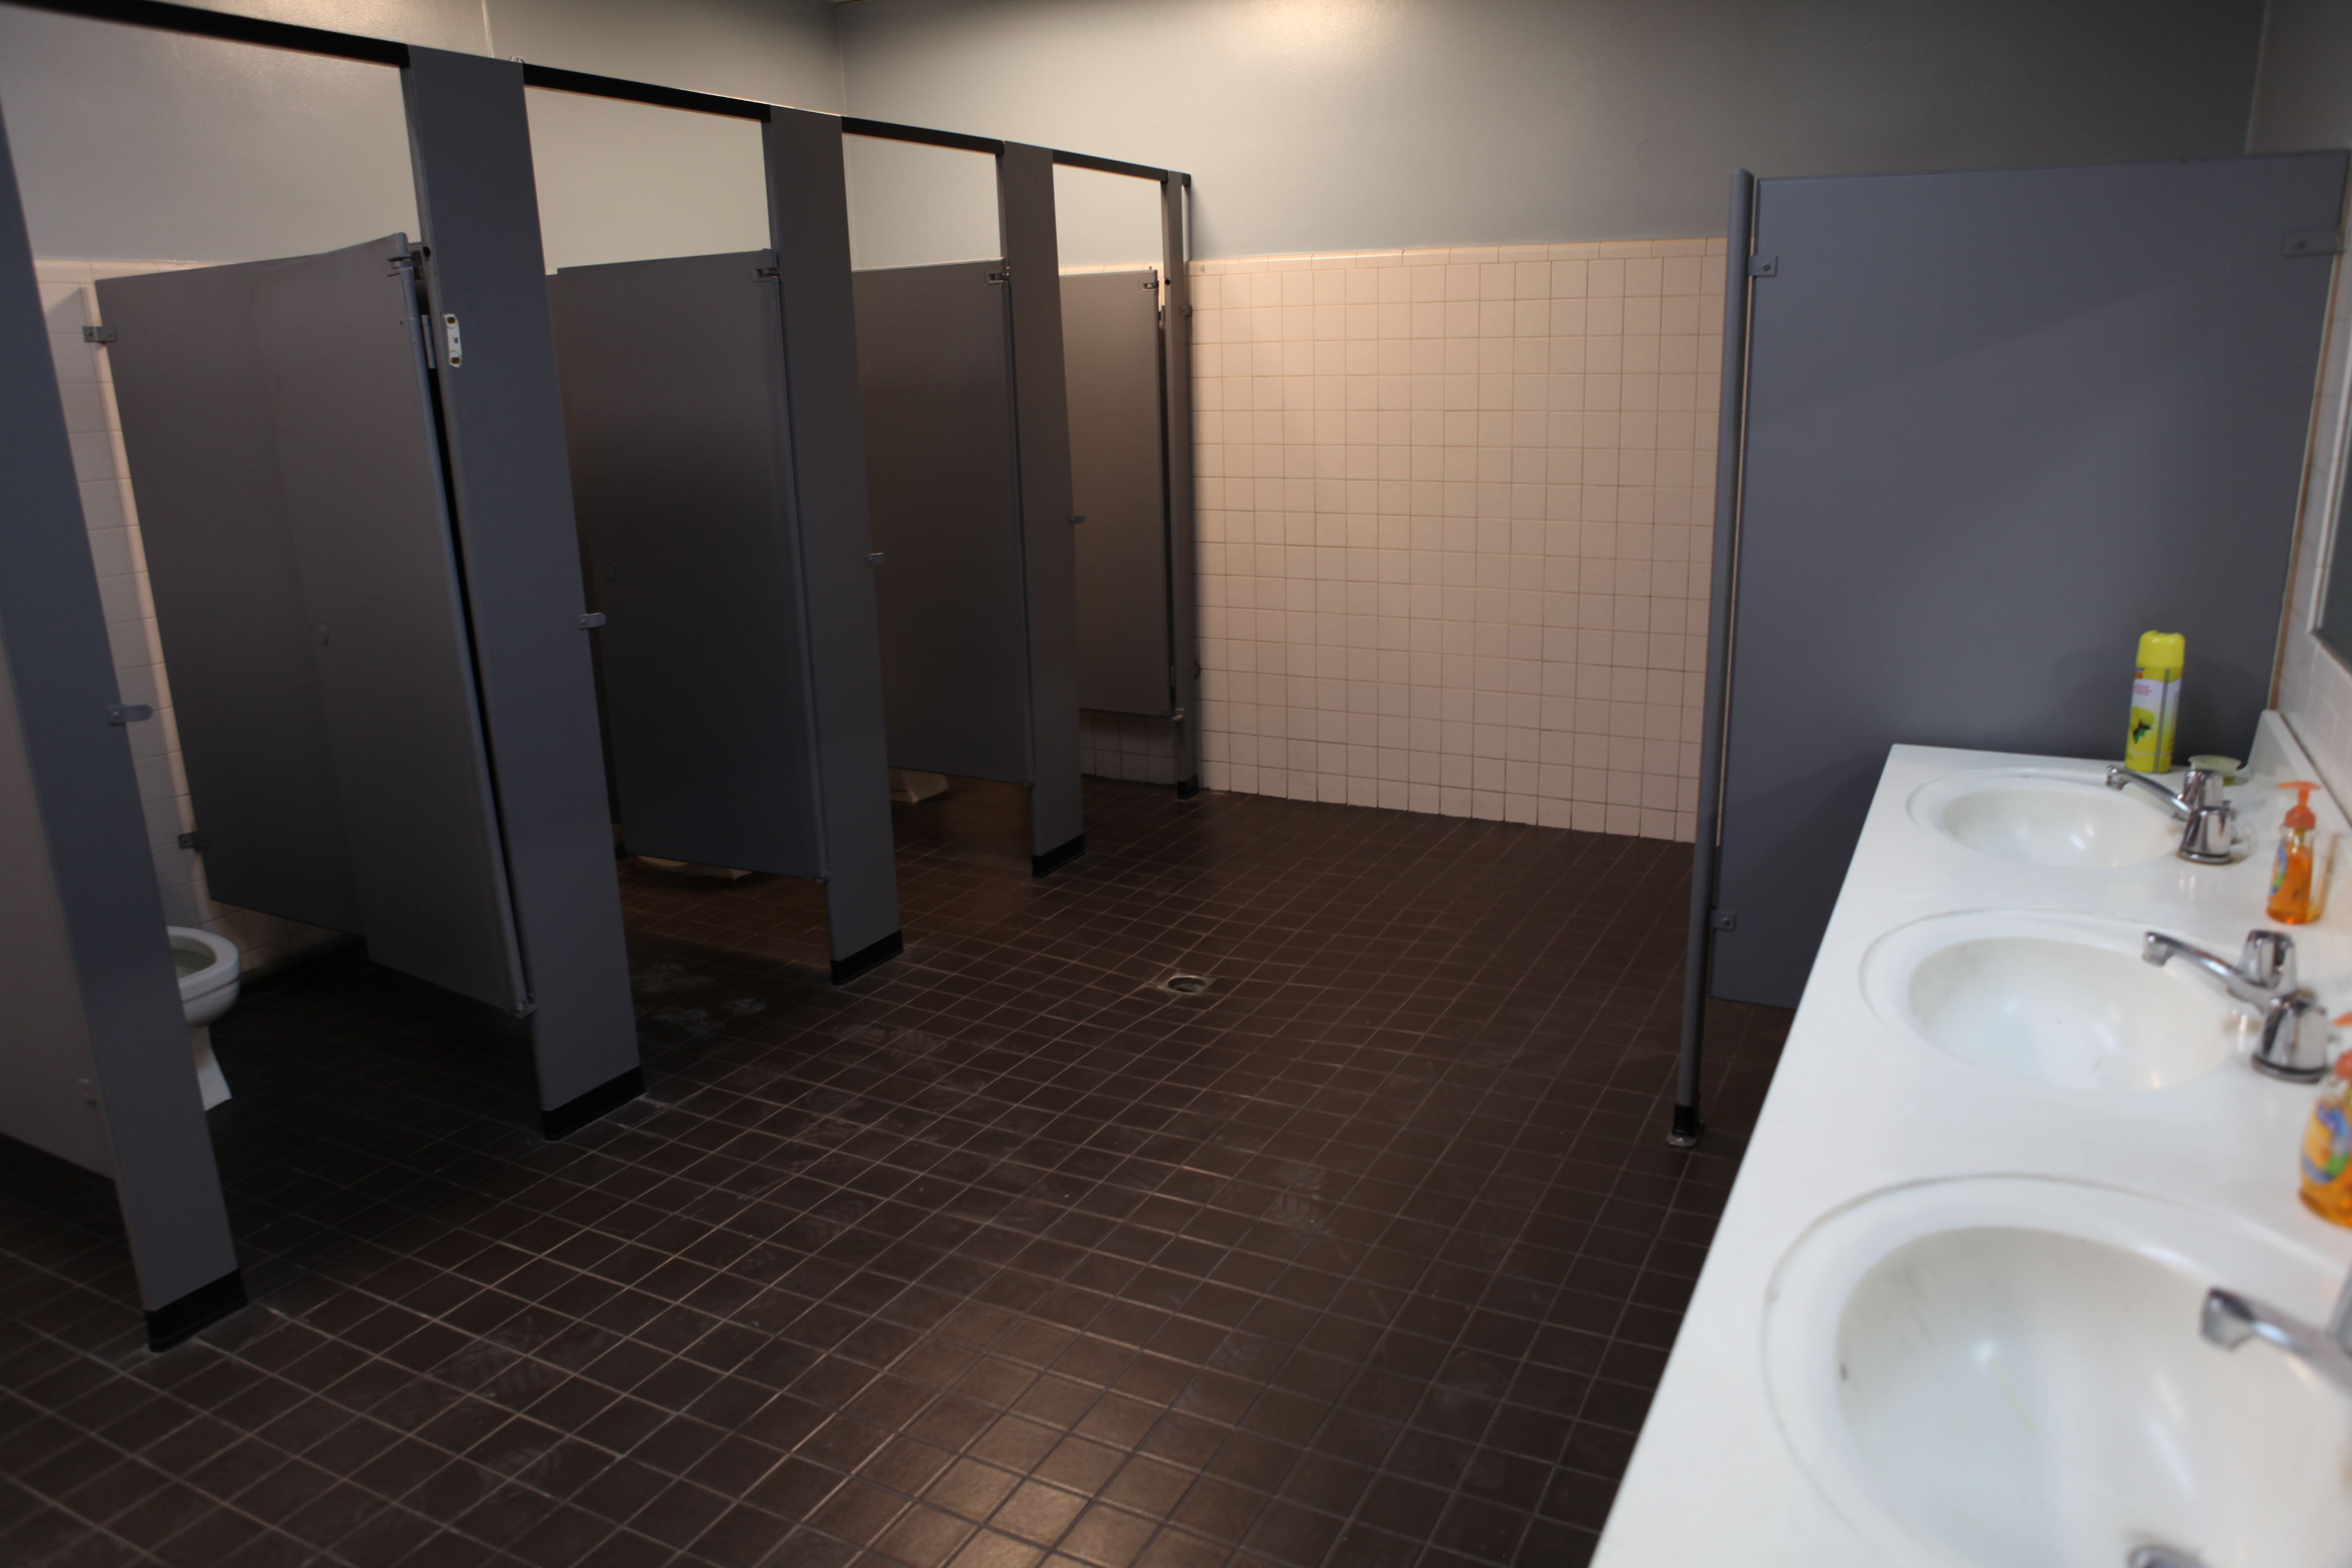 office bar police bathroom los angeles filming location bathroom office